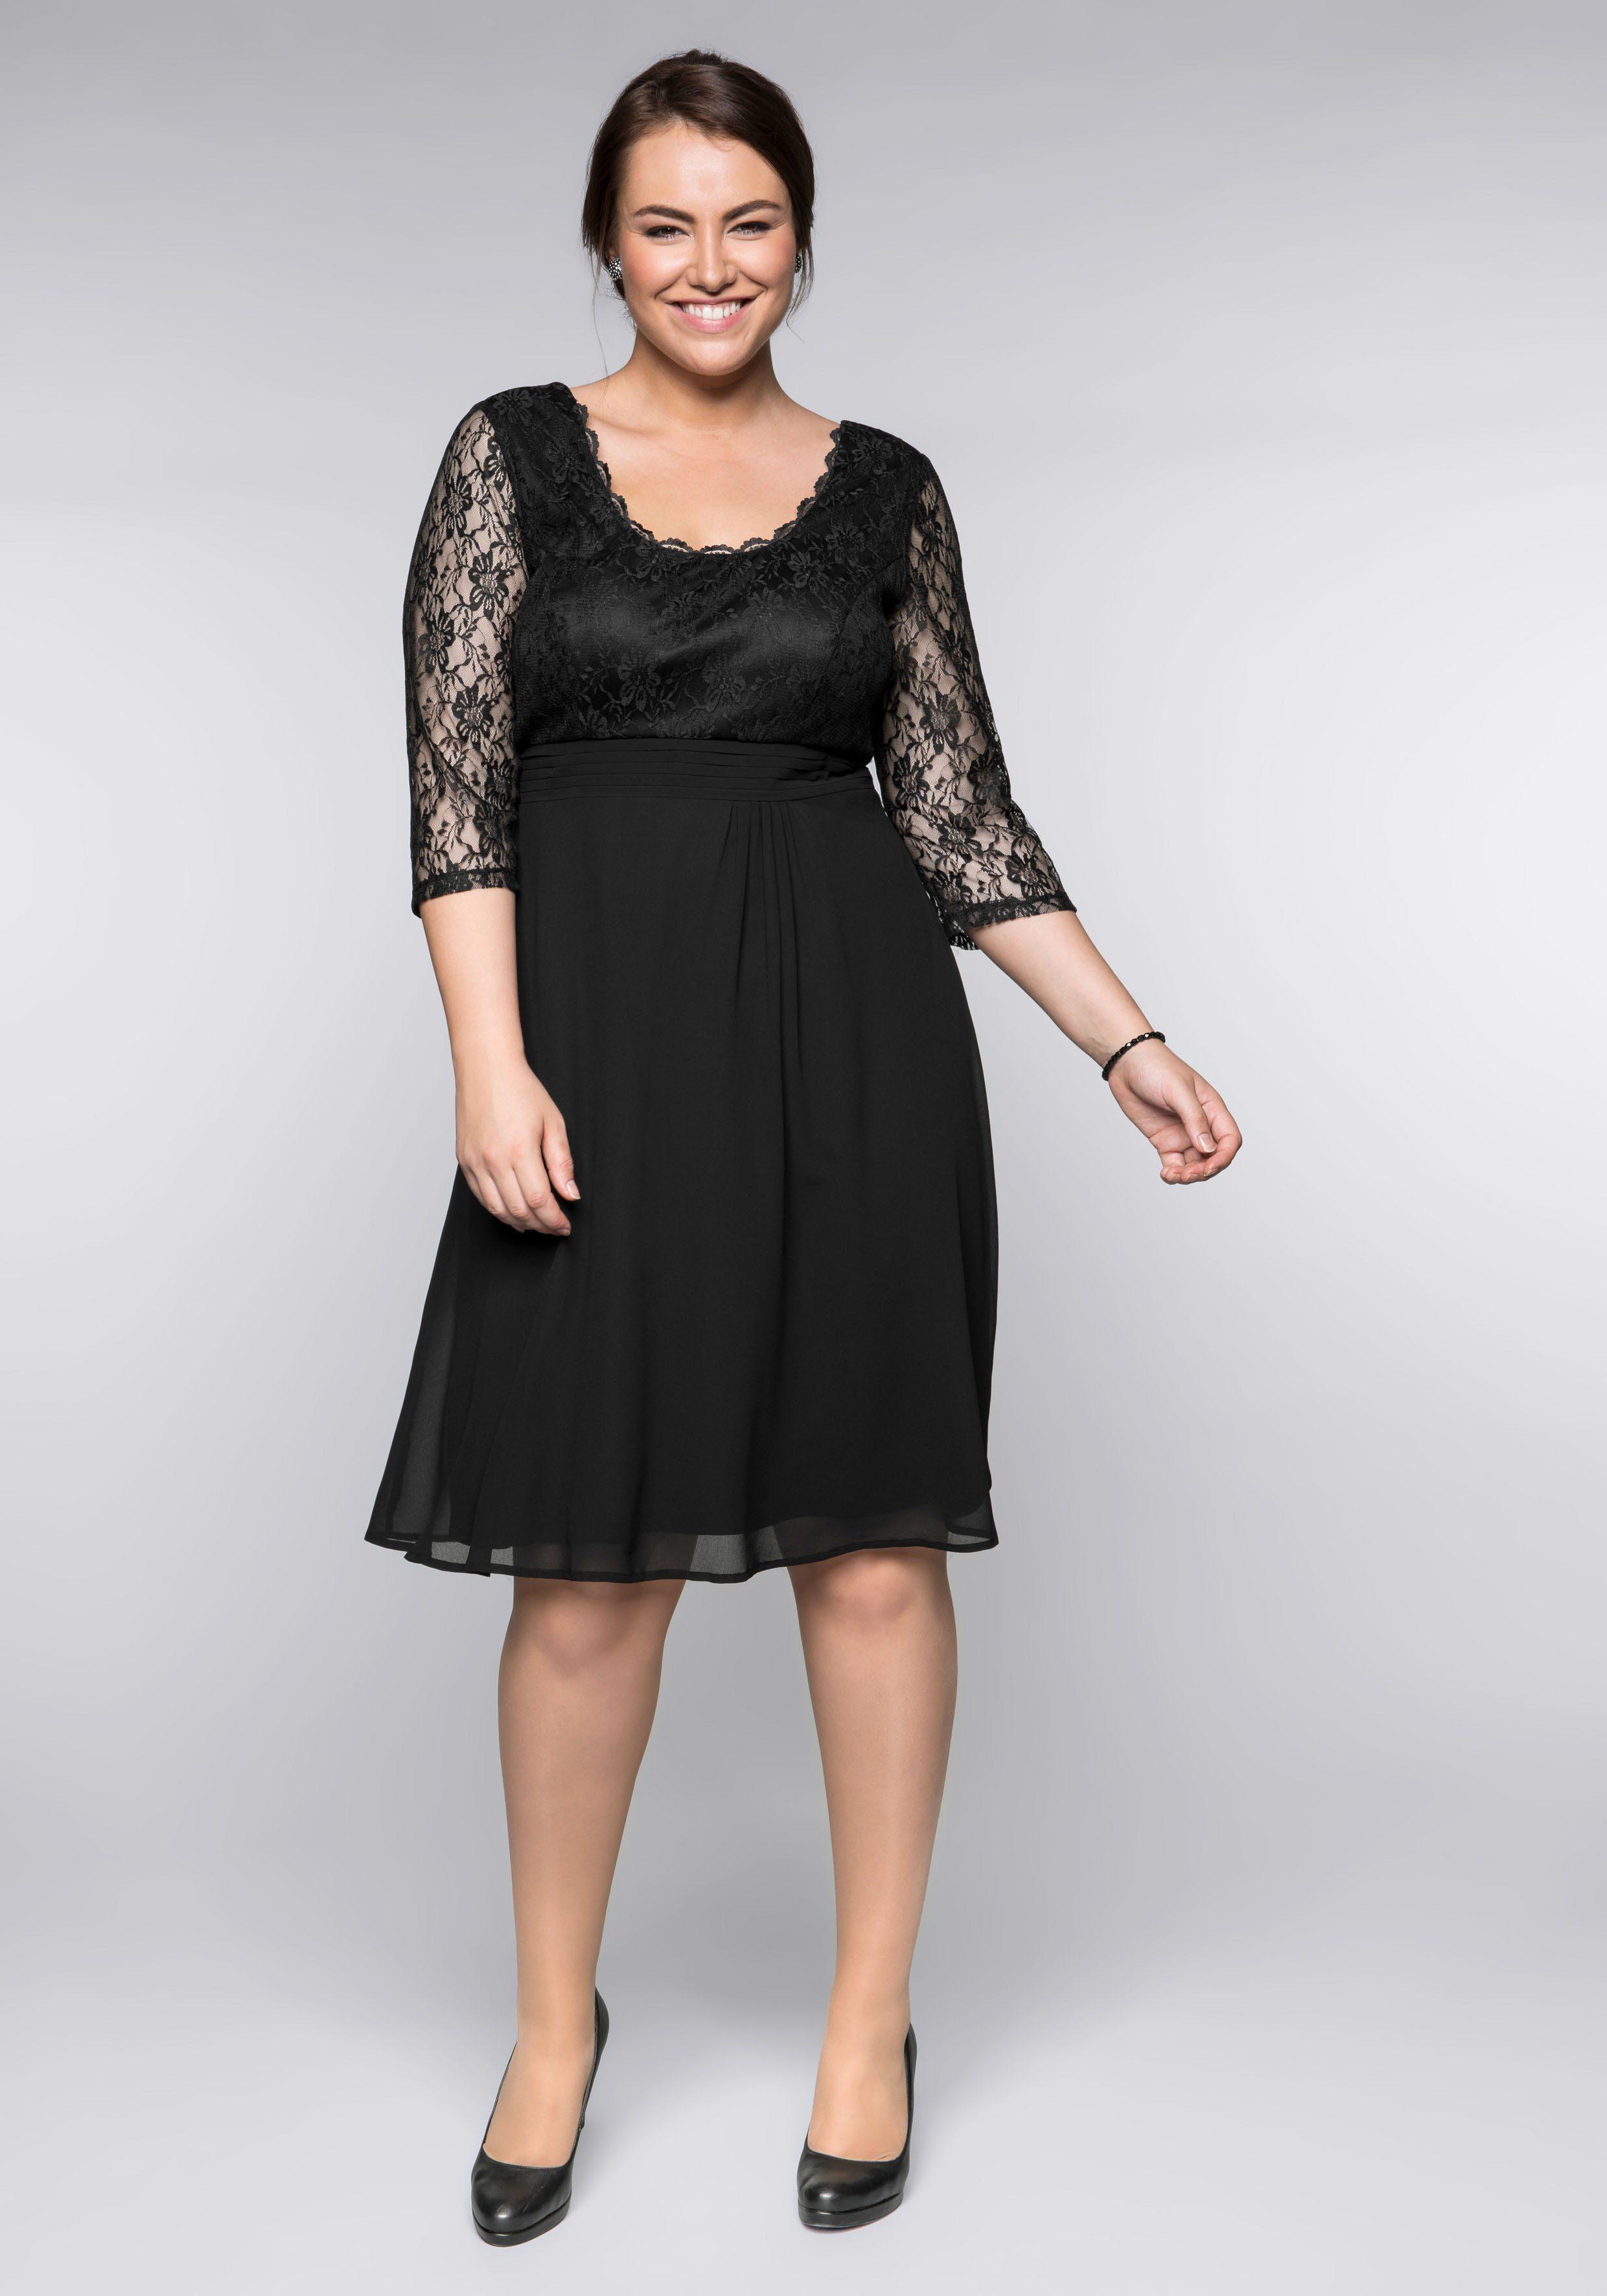 Sheego Style Sheego Abendkleid Damenmode/Bekleidung/Kleider/Abendkleider